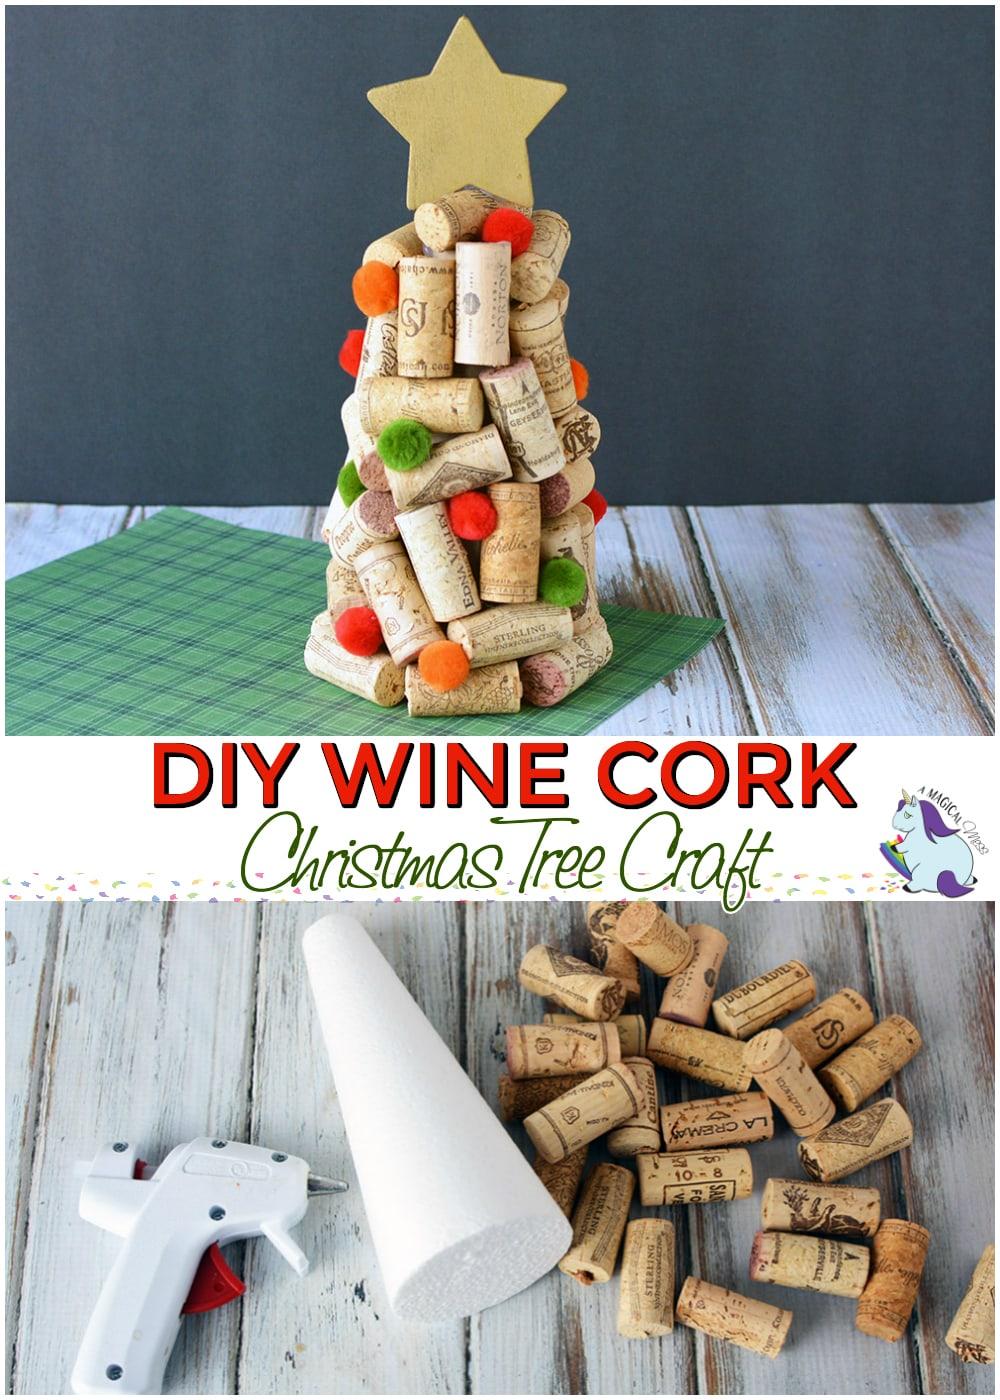 DIY Wine Cork Christmas Trees Craft #diy #crafts #holiday #homemadegifts #winecorks